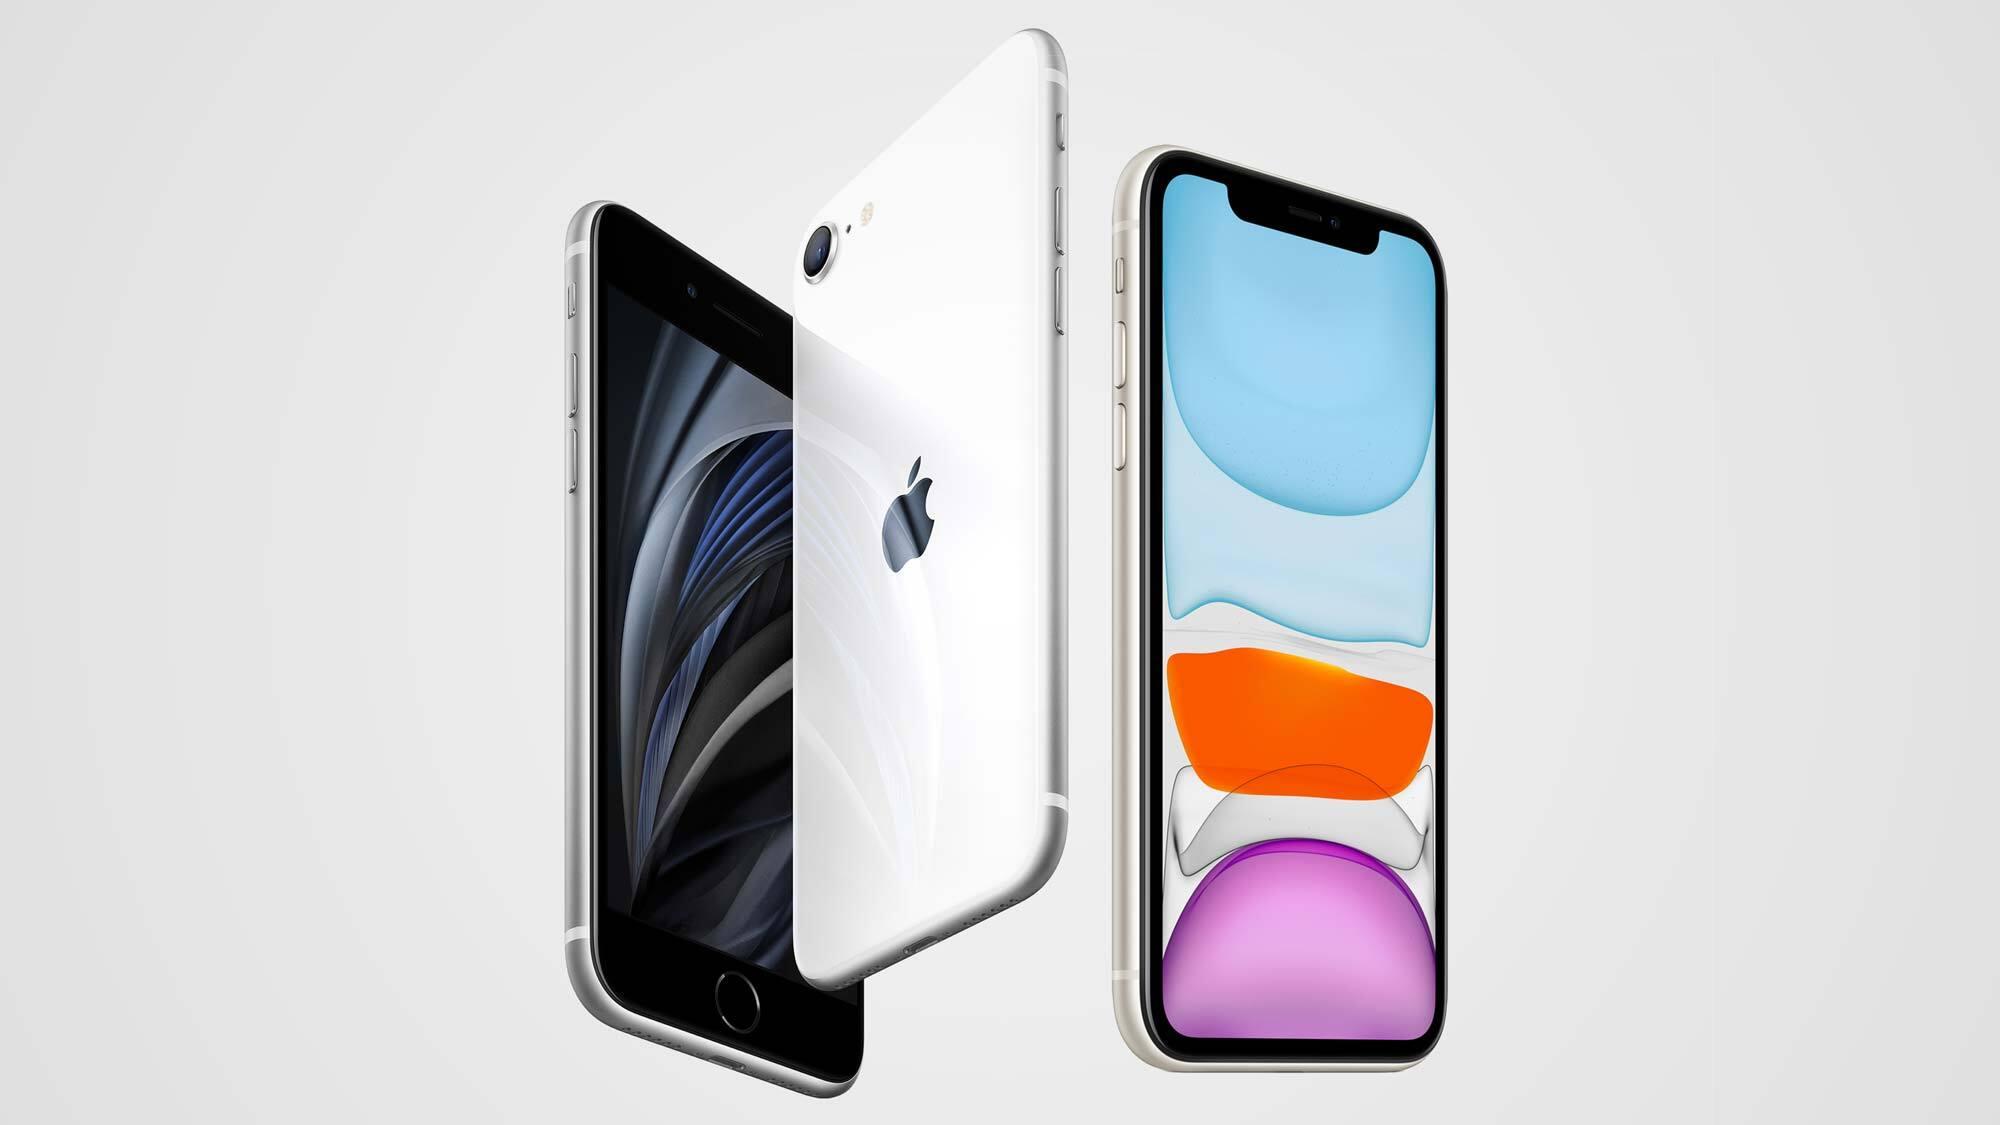 Harga Asli iPhone SE 2020 Ternyata Hanya Rp 3 Jutaan ...